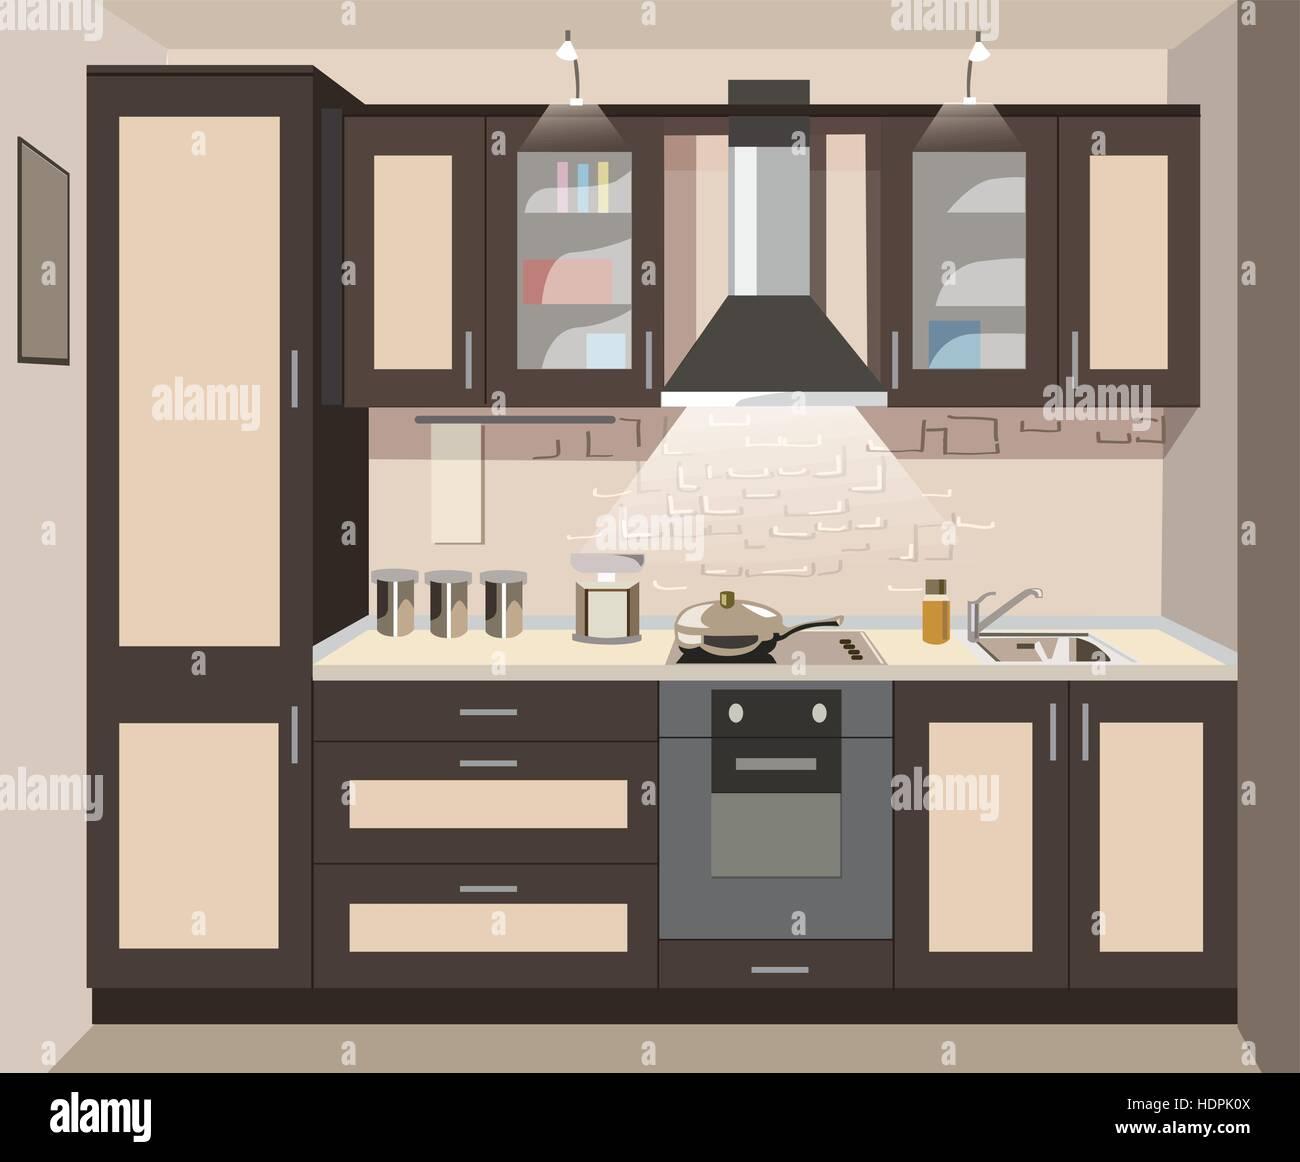 Vector Kitchen Interior Card Flat Illustration Stock Vector Art